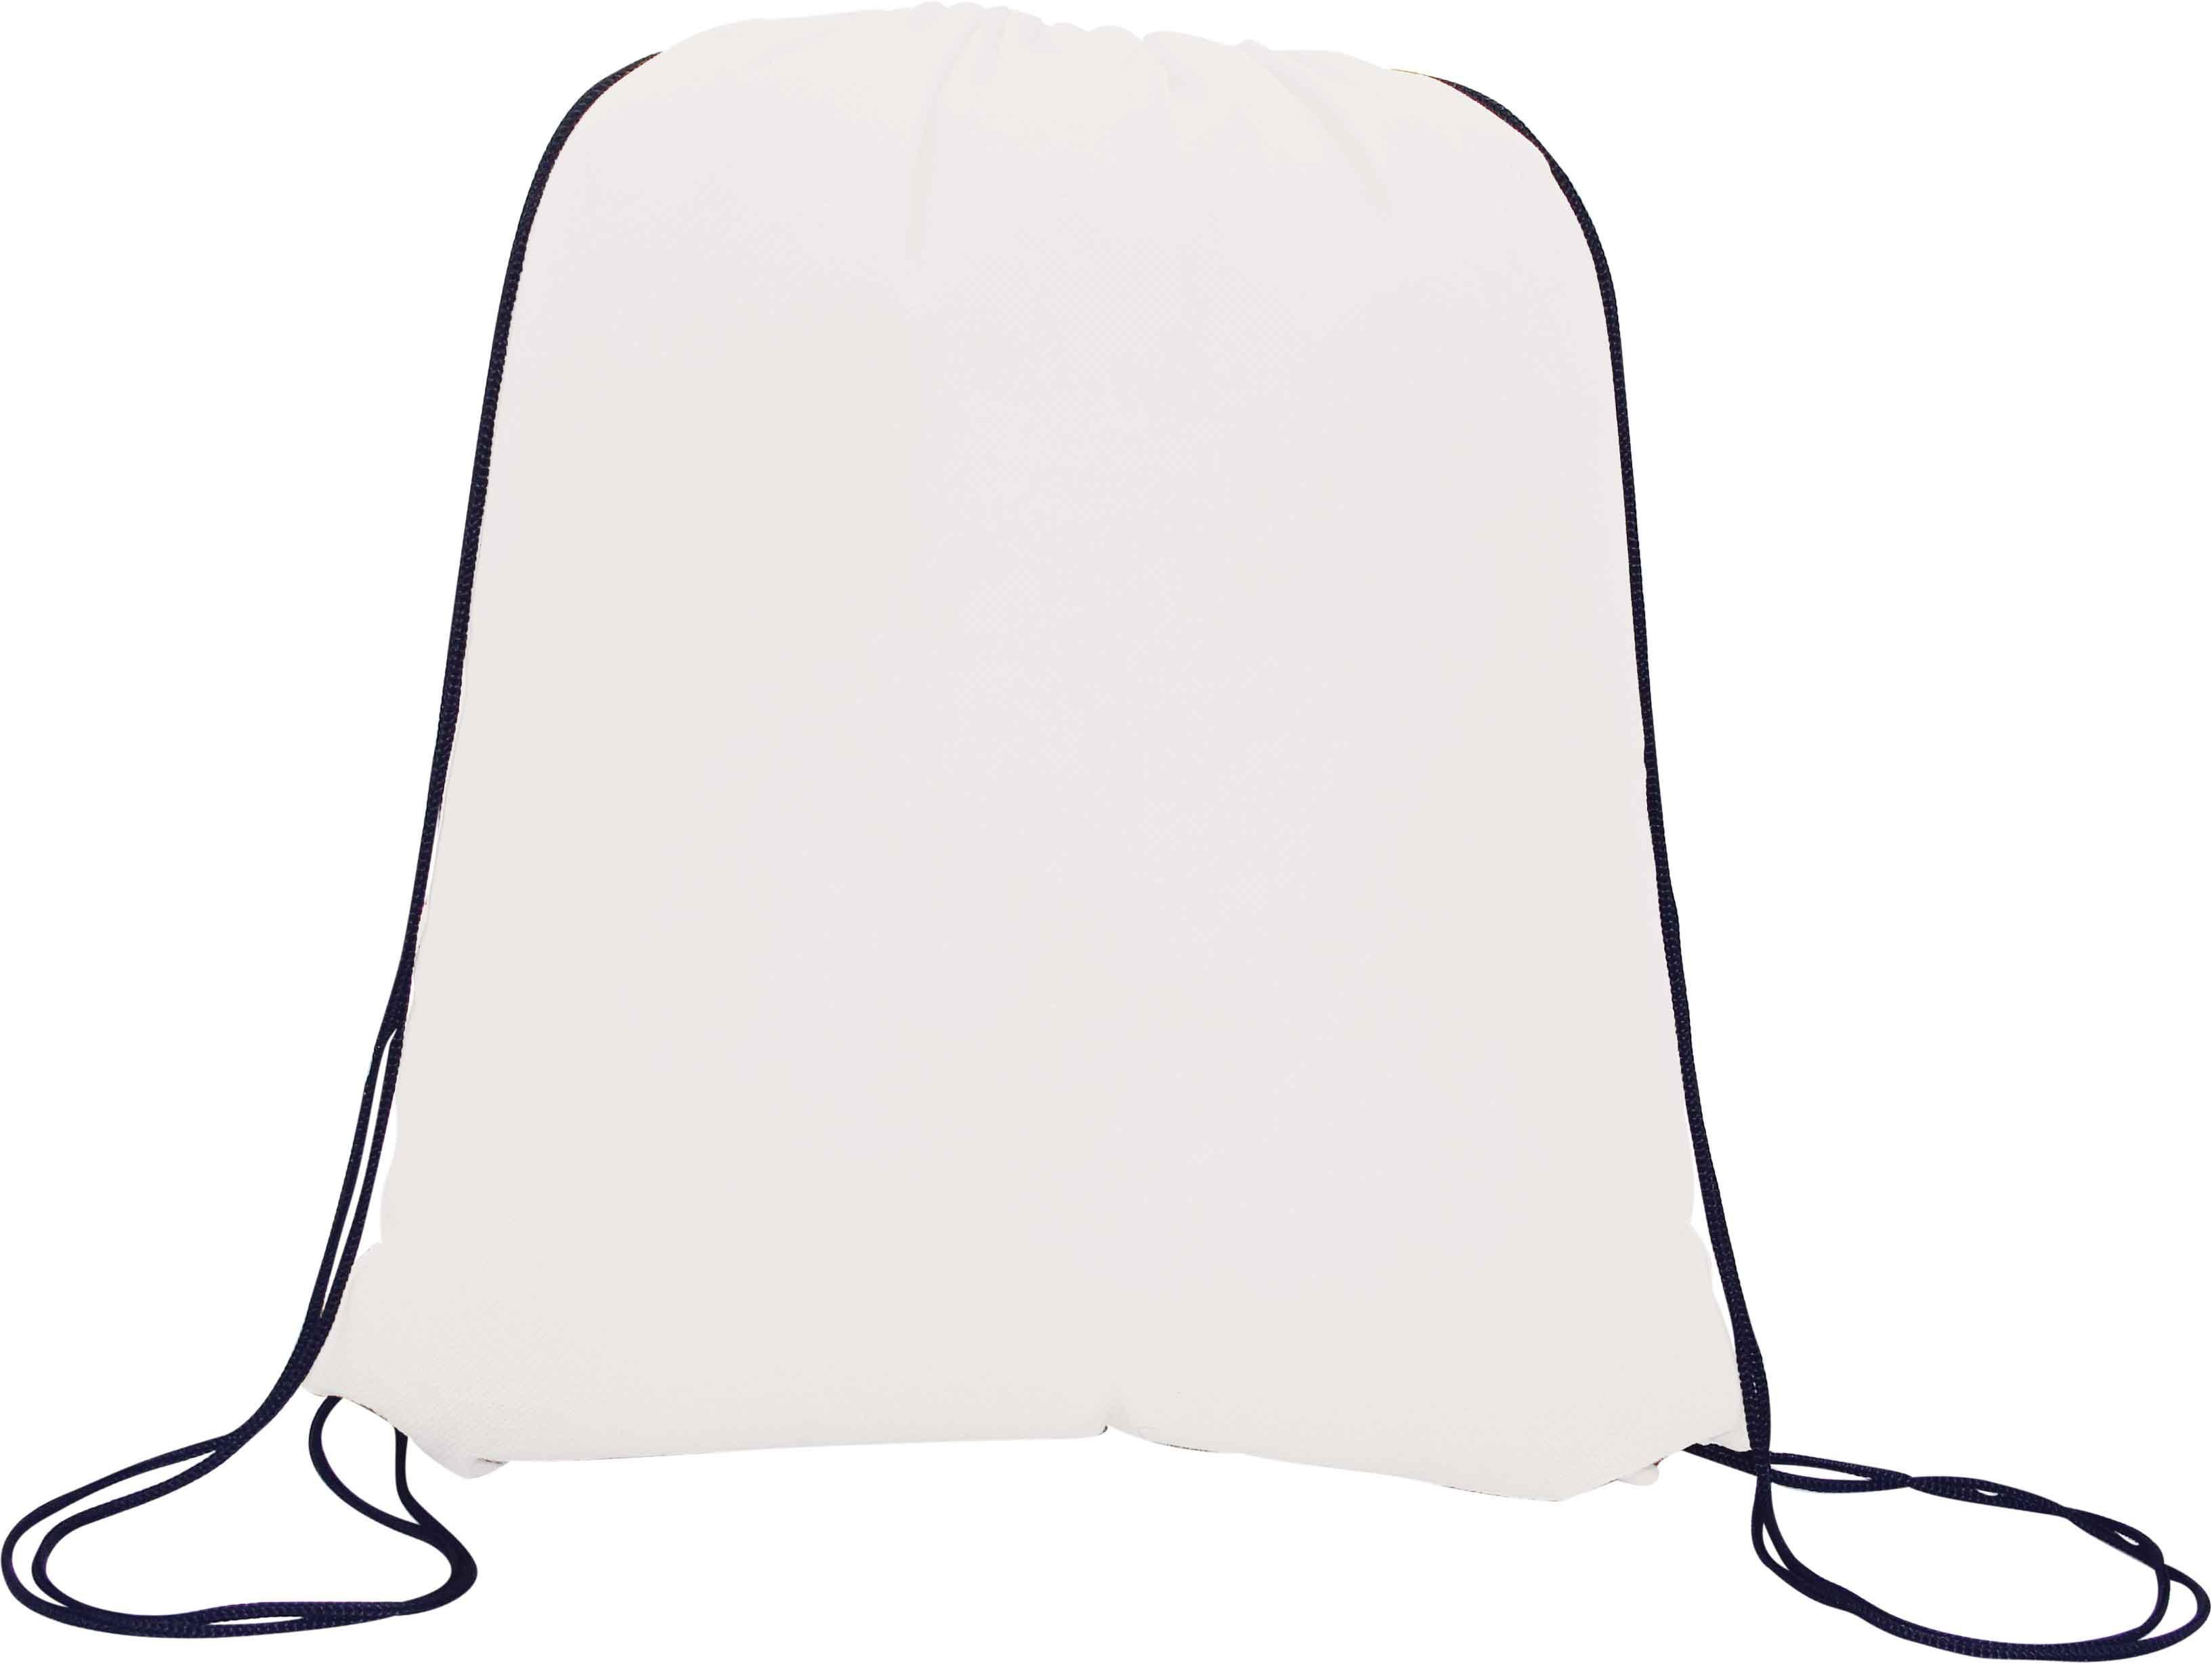 Drawstring Bag (White) - Min Order 100